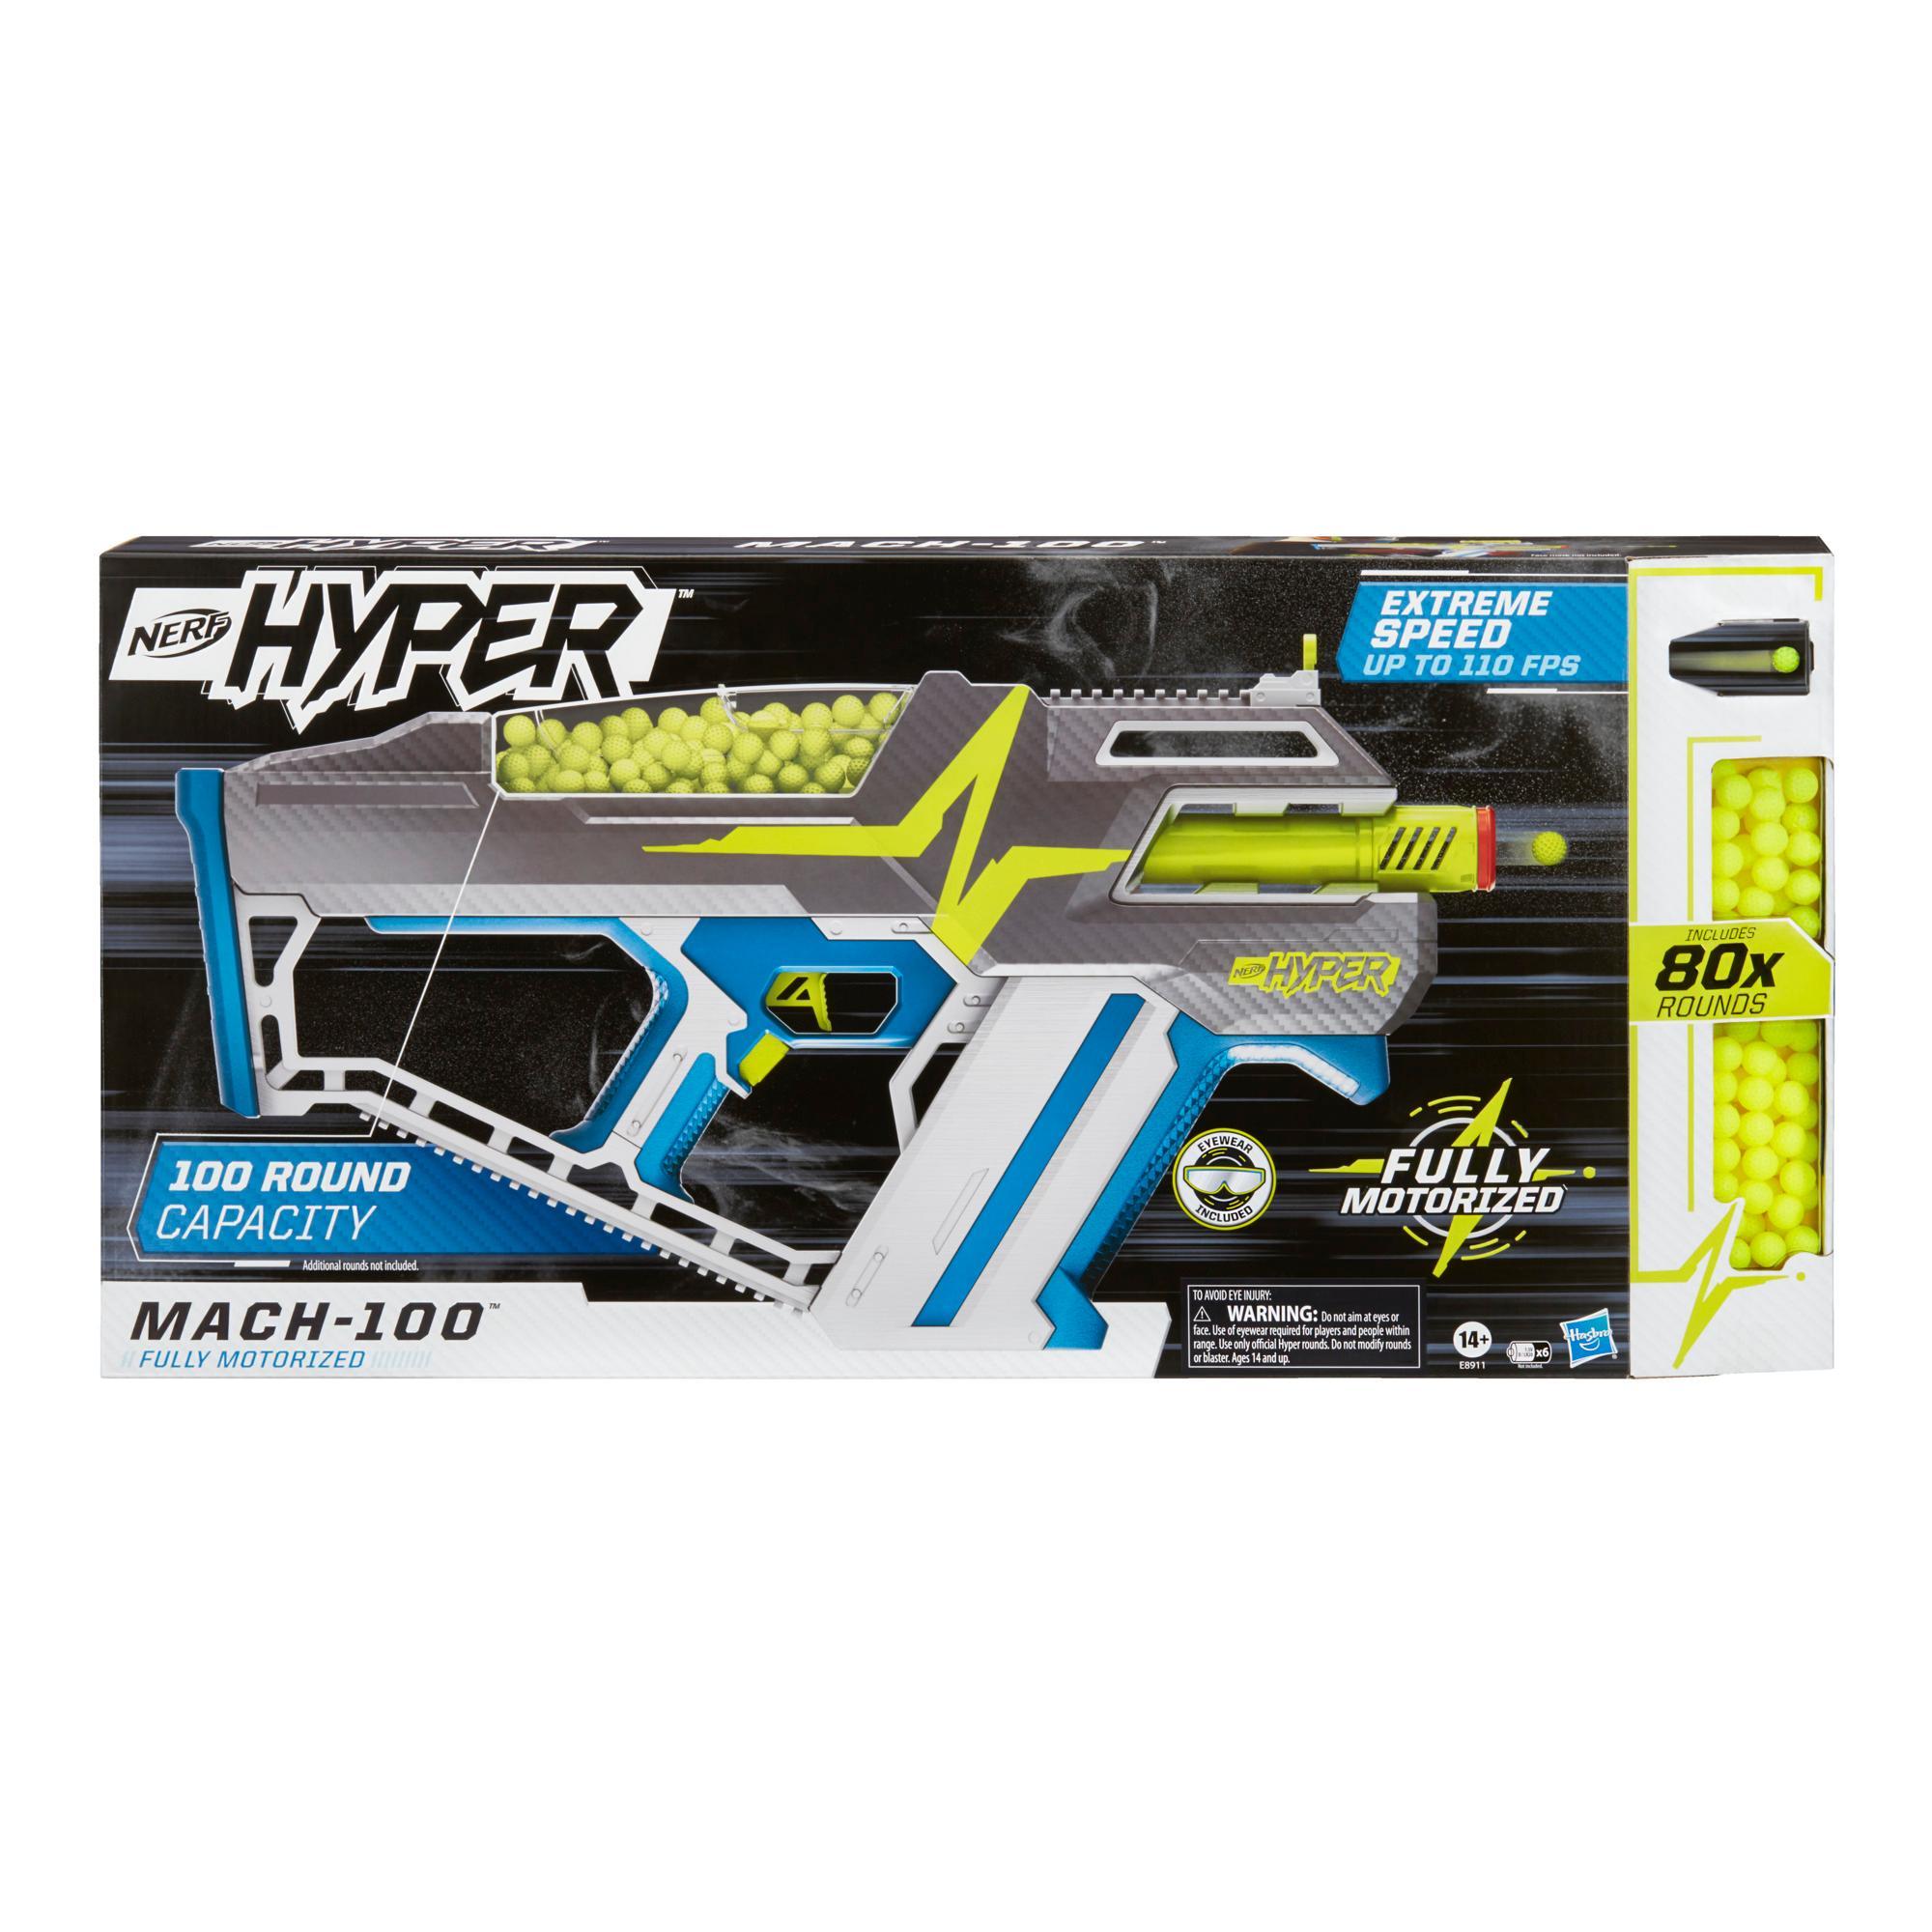 Nerf Hyper Mach-100 Fully Motorized Blaster and 80 Nerf Hyper Rounds, 110 FPS Velocity, Easy Reload, 100-Round Capacity